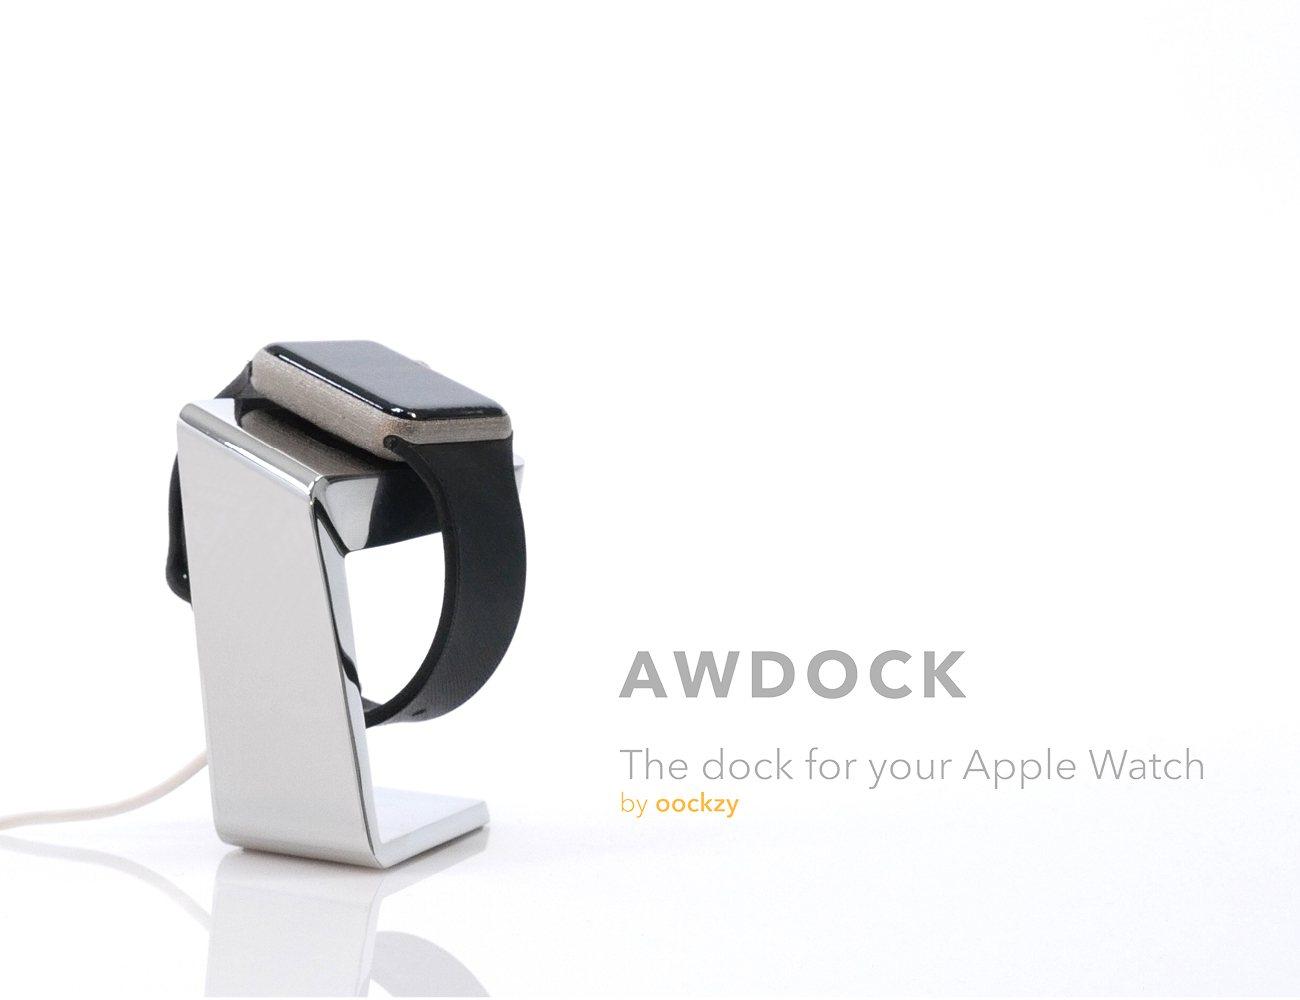 awdock-01